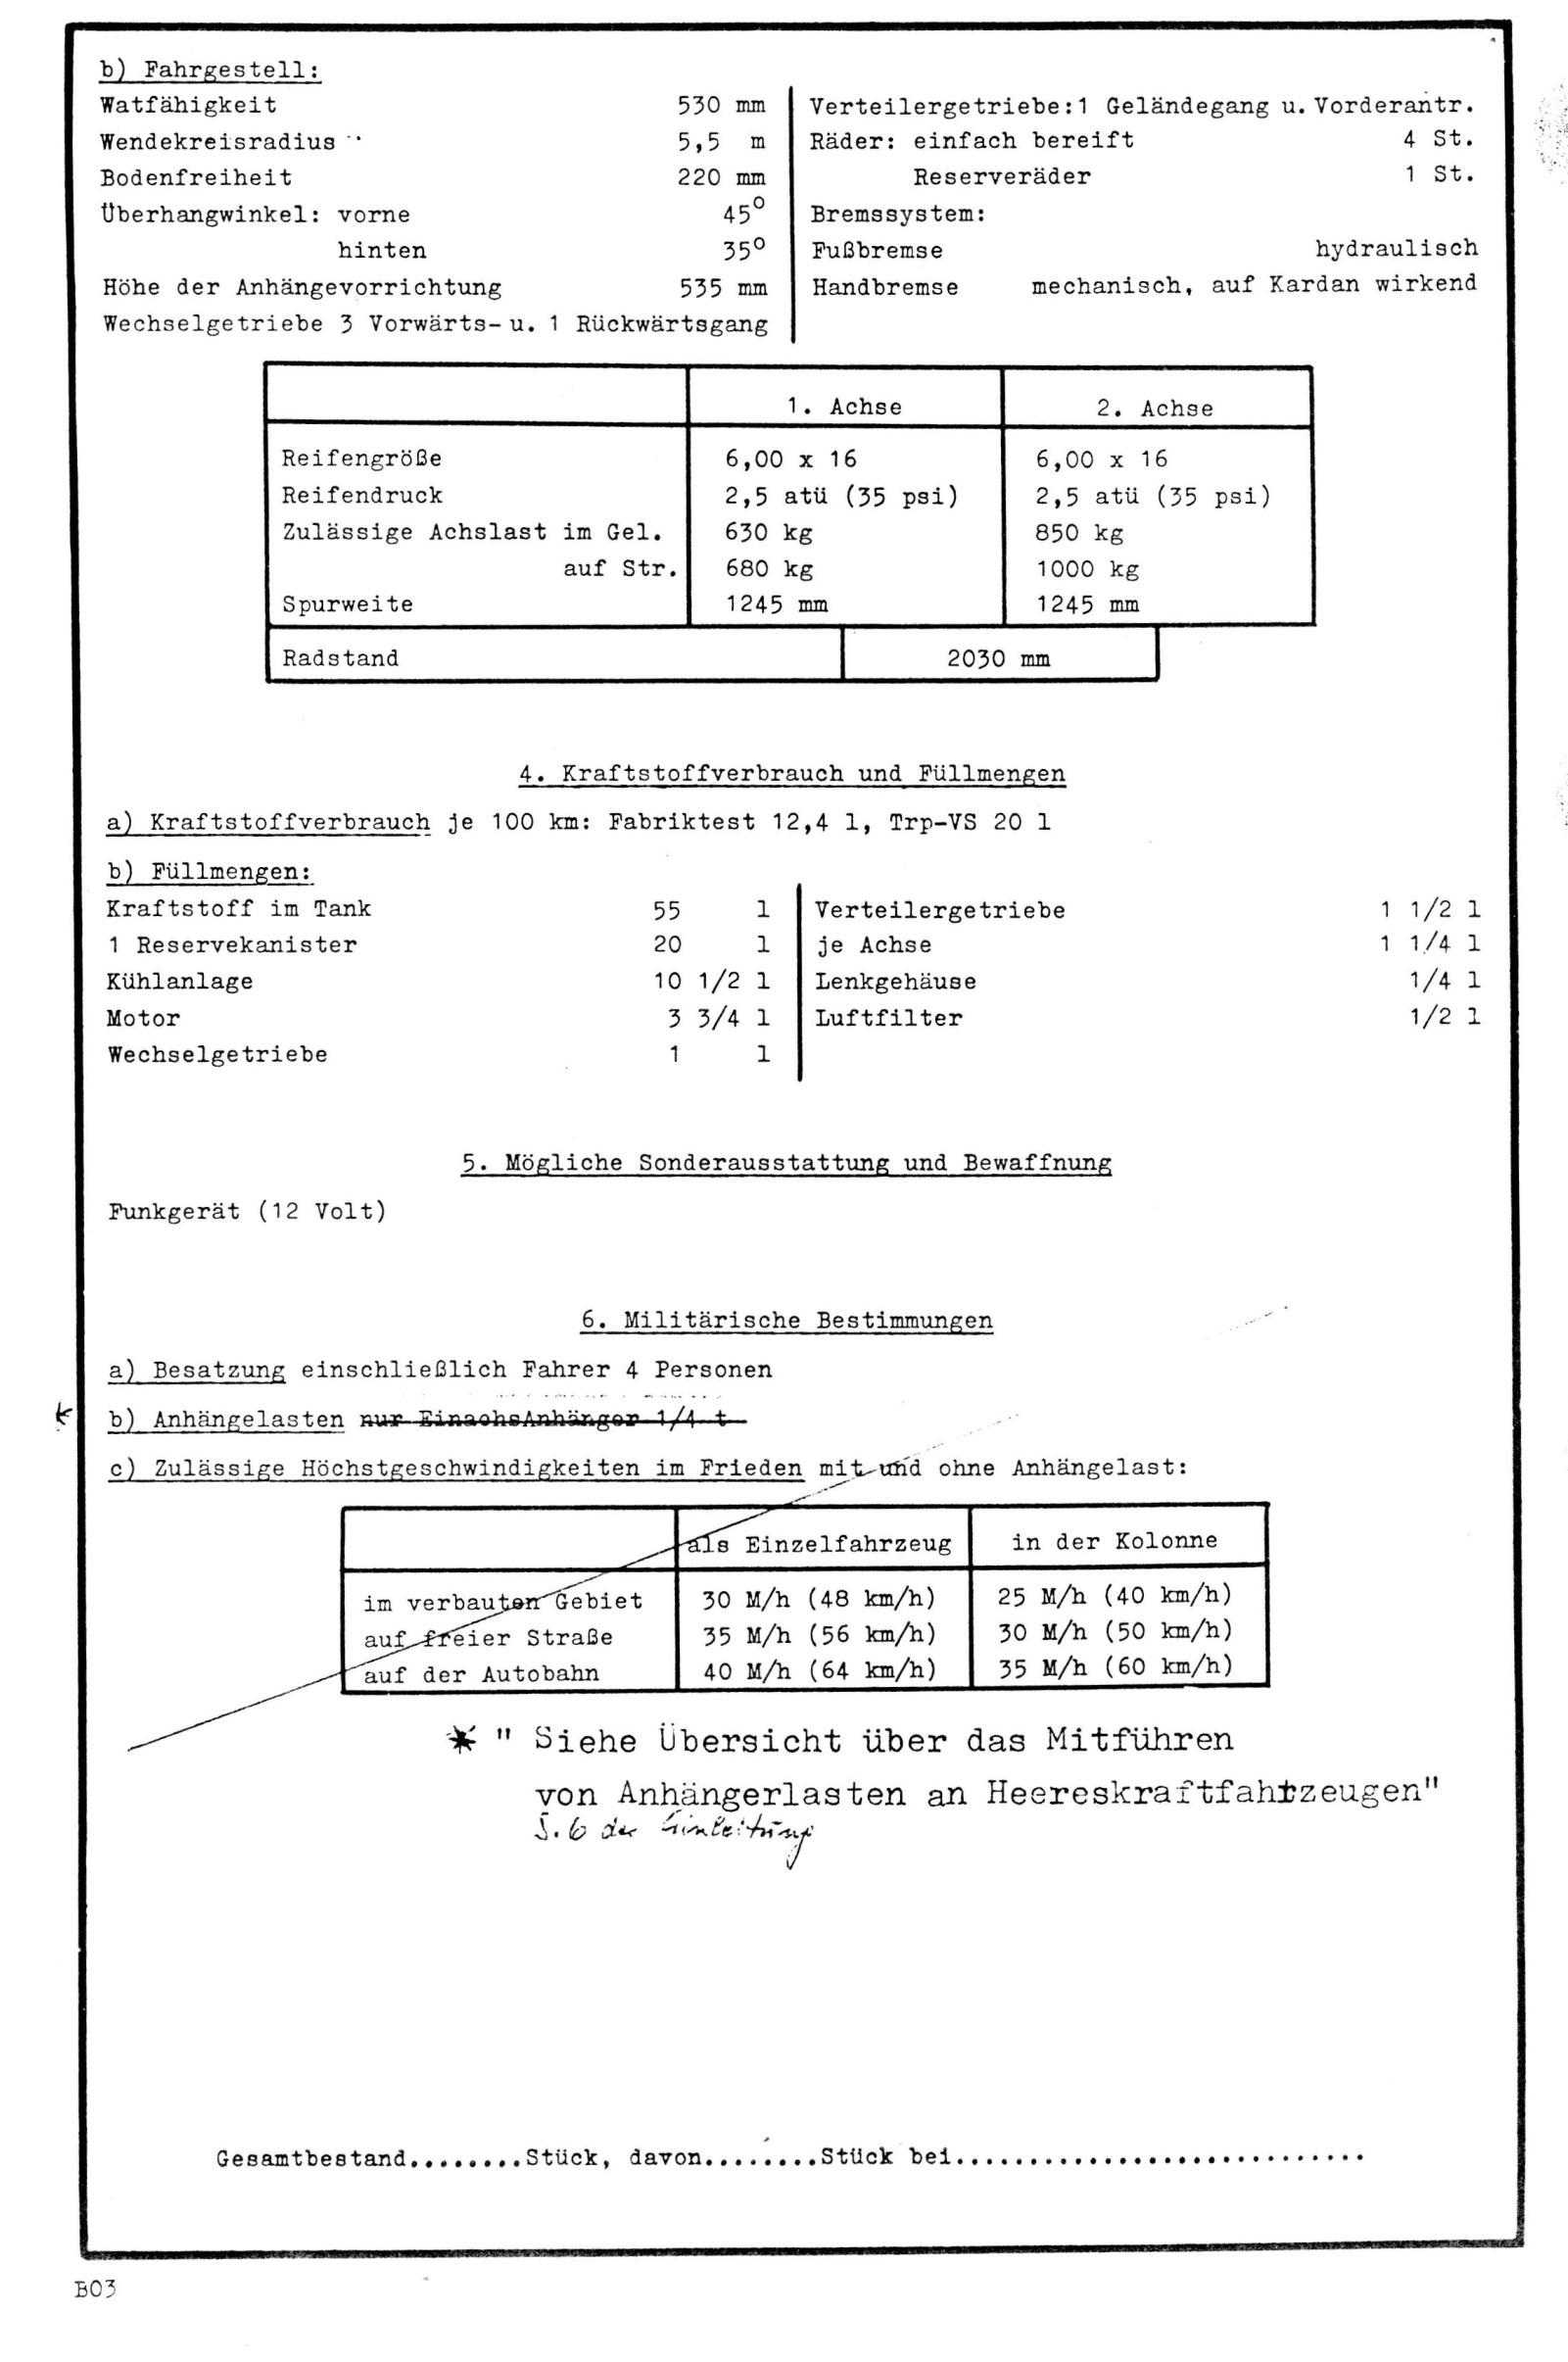 D:\Archiv Nemeth\Fzg-Gerät-Ausrüstung\Fahrzeuge\Mehrspurige Kfz\BH Fahrzeuge\Jeep\B03 b.jpeg